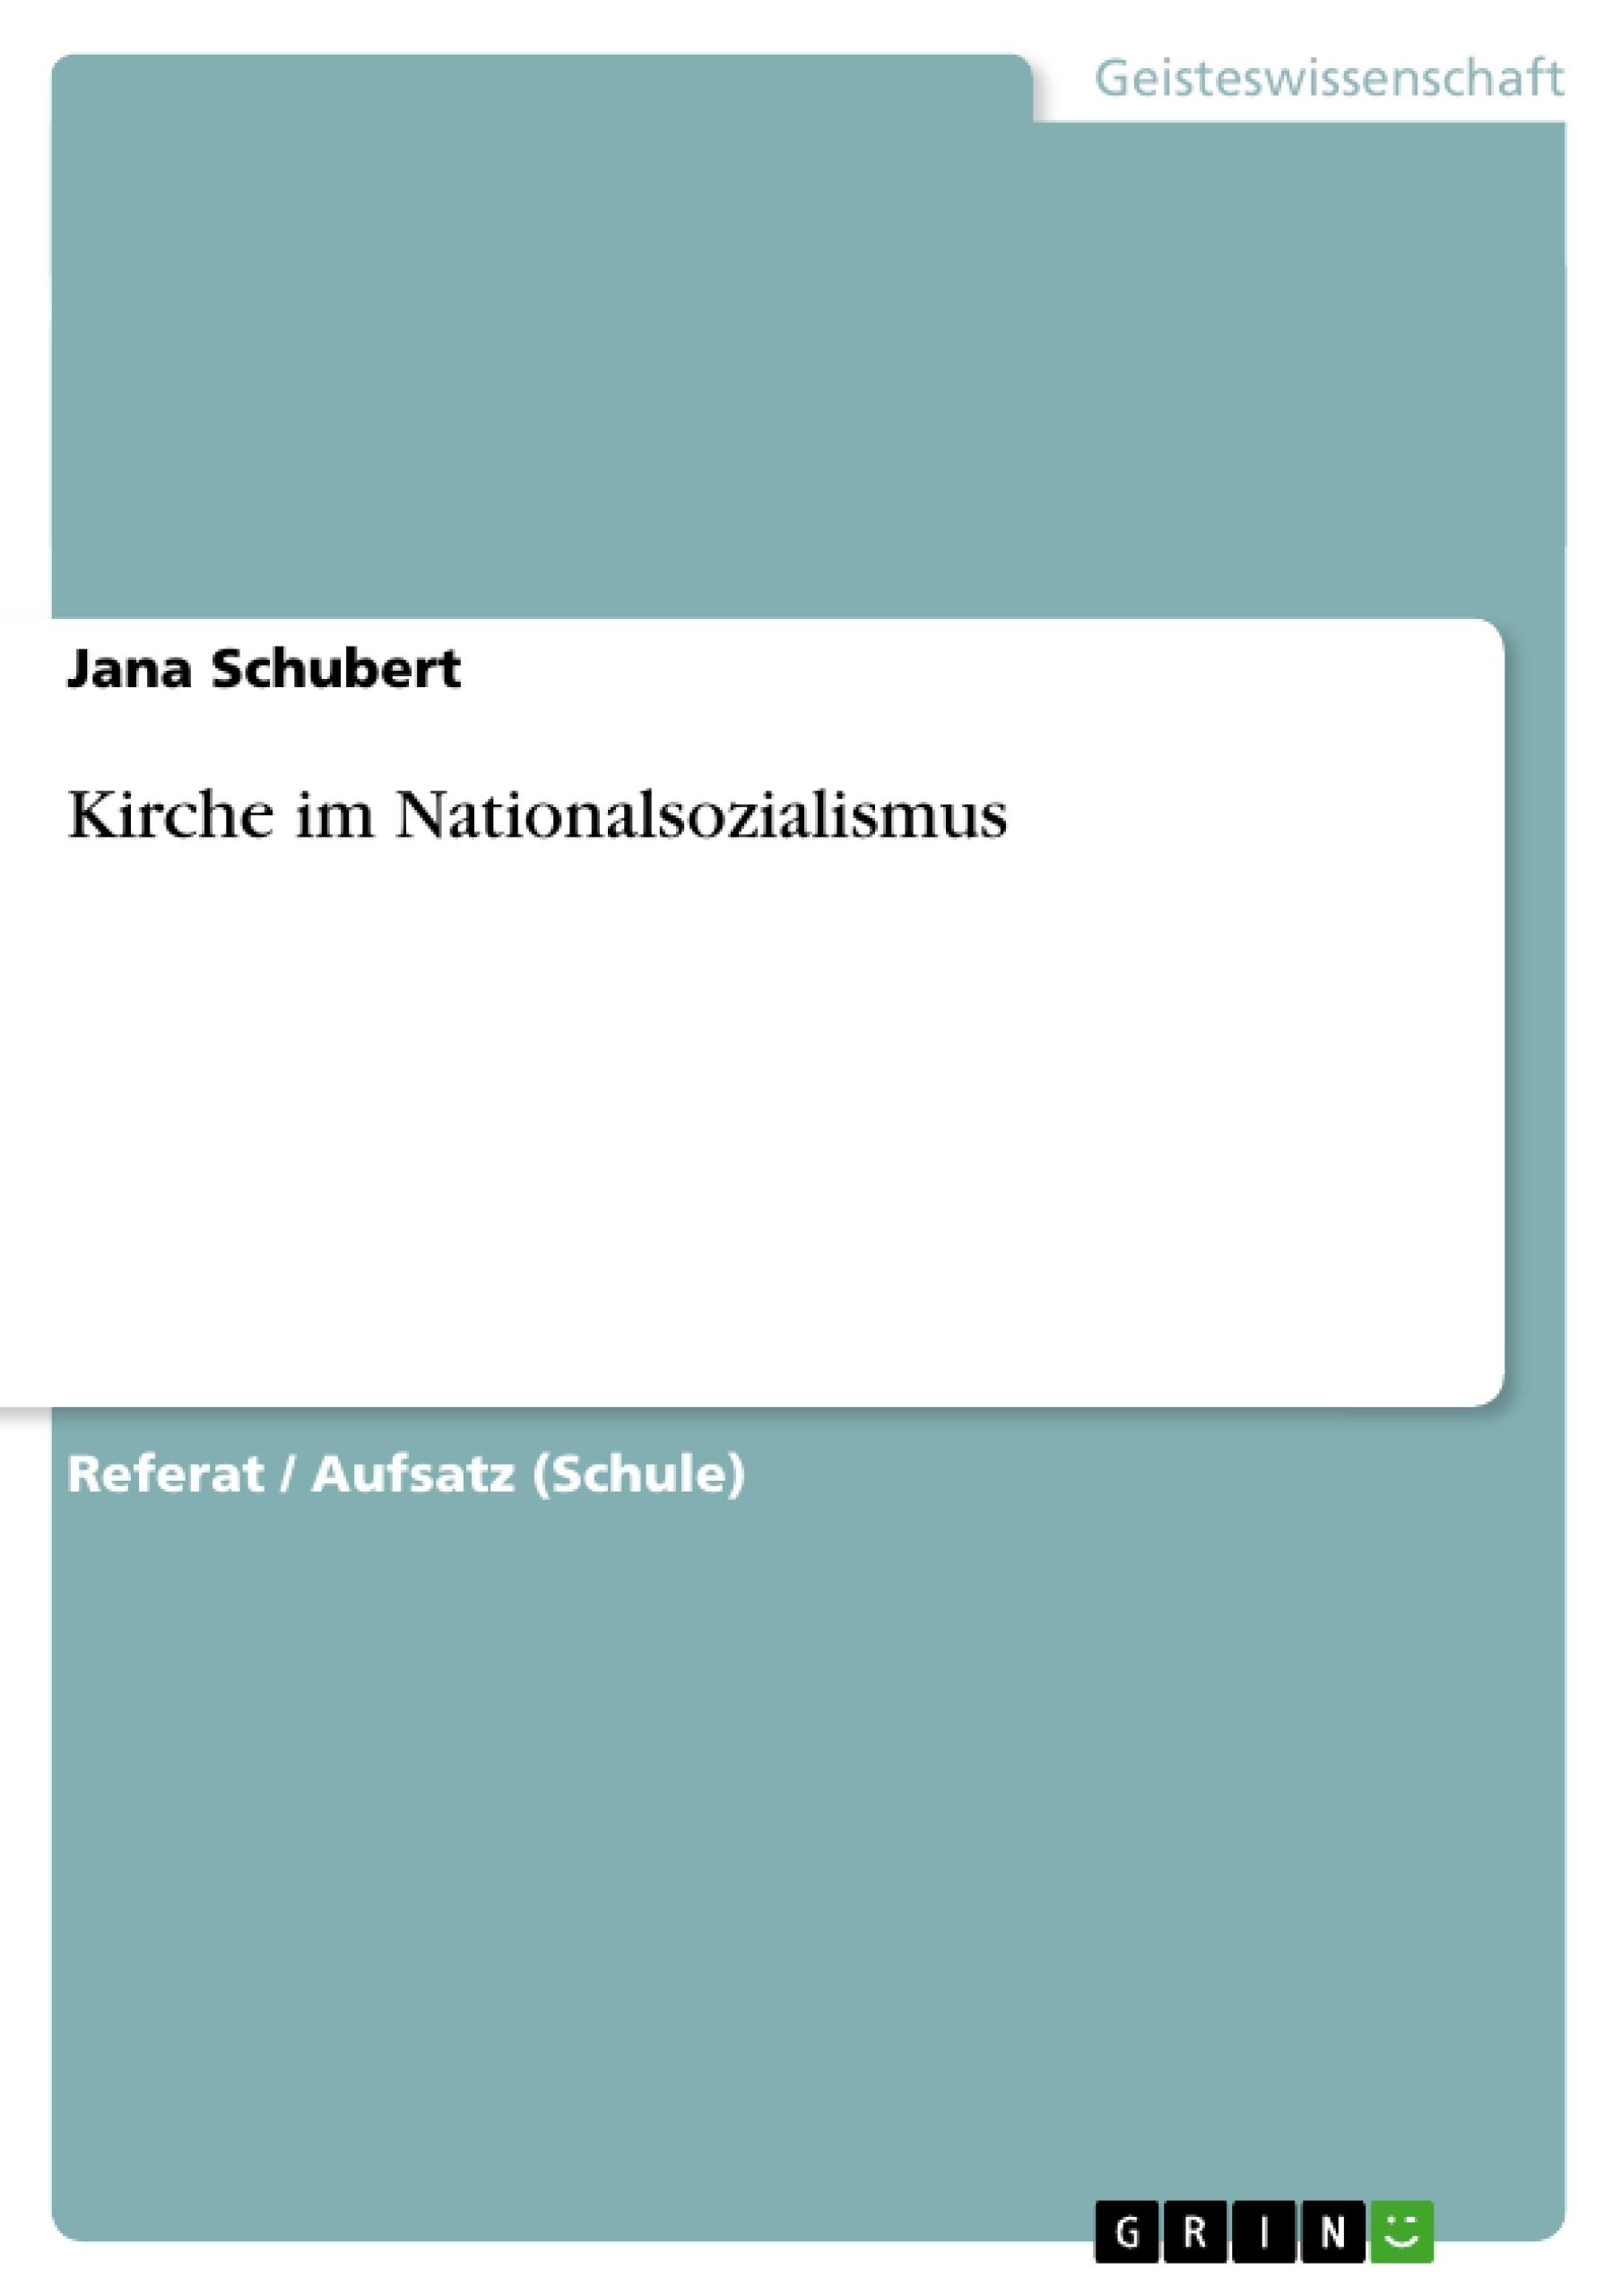 Titel: Kirche im Nationalsozialismus